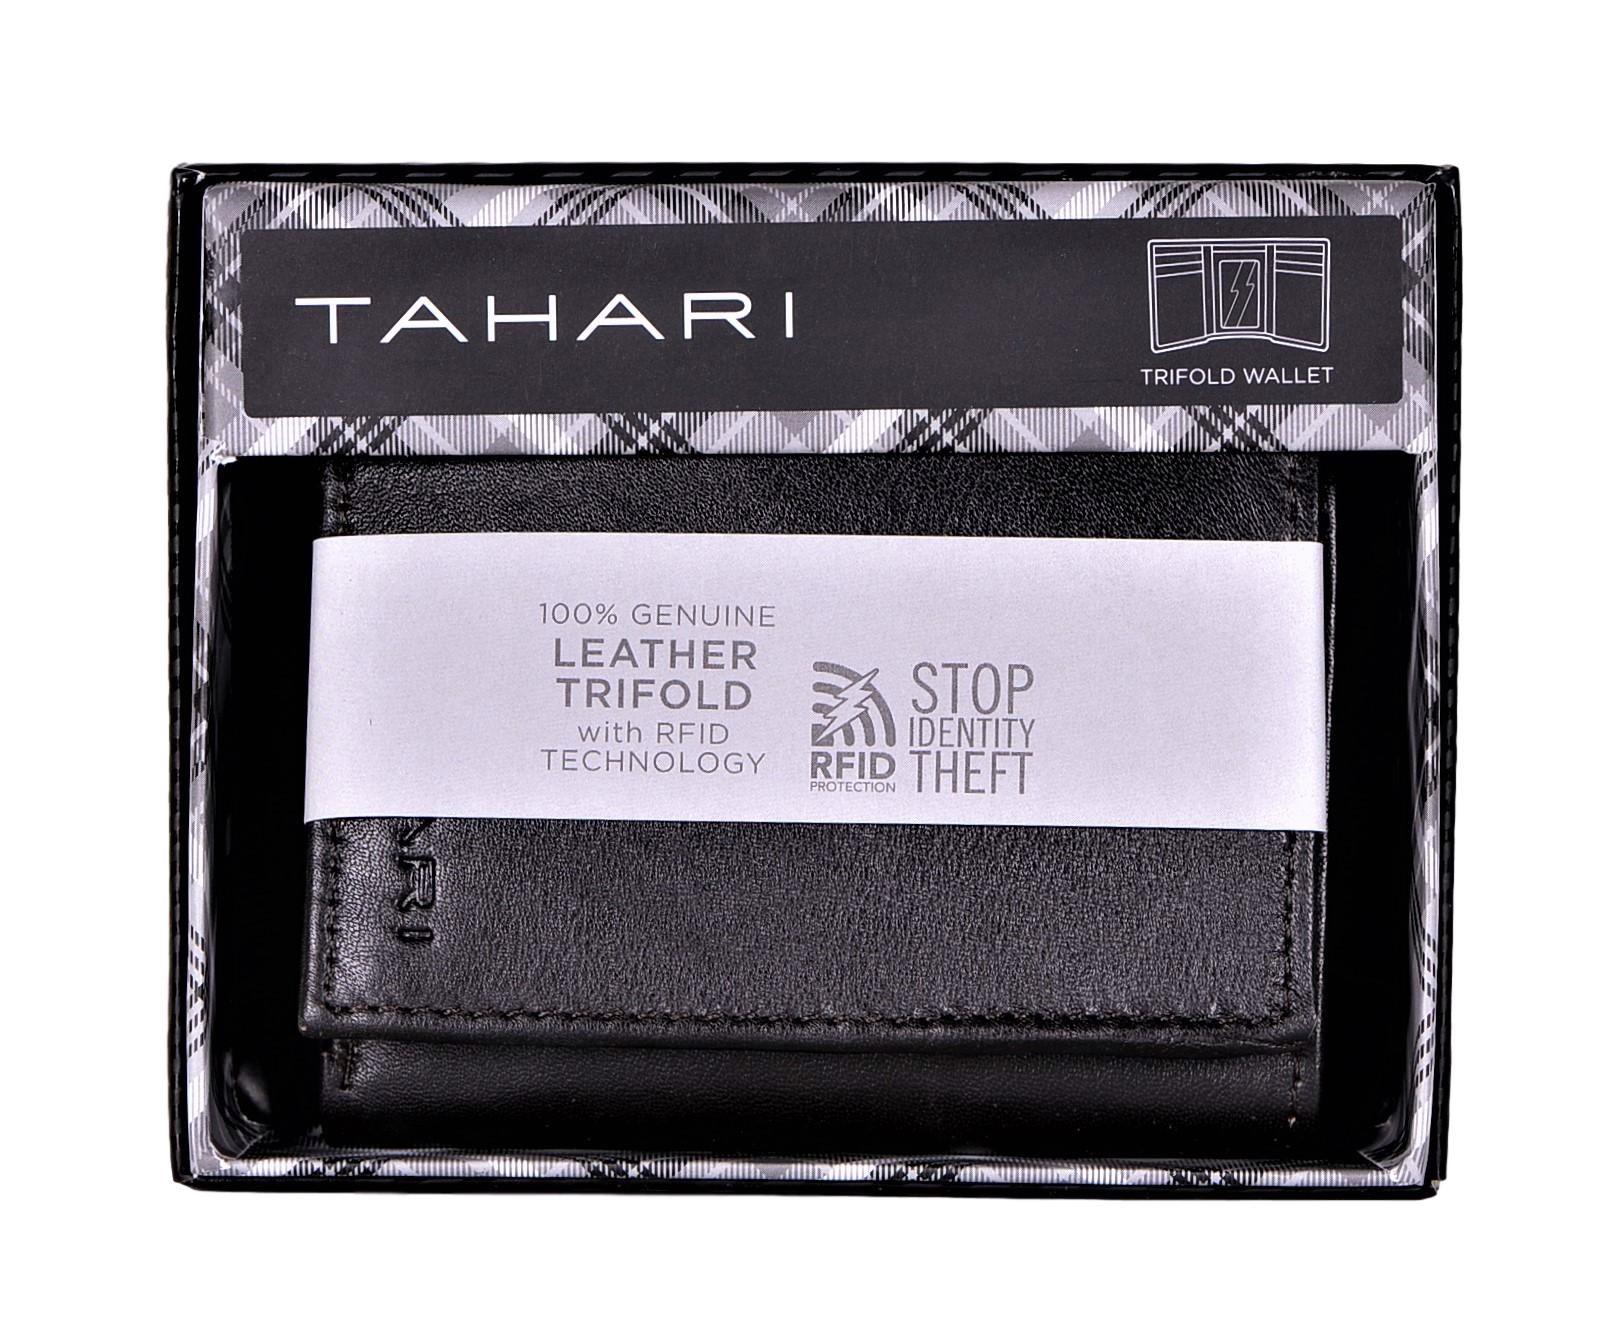 Tahari-Men-039-s-RFID-Security-Blocking-Leather-Glove-Trifold-Wallet thumbnail 15